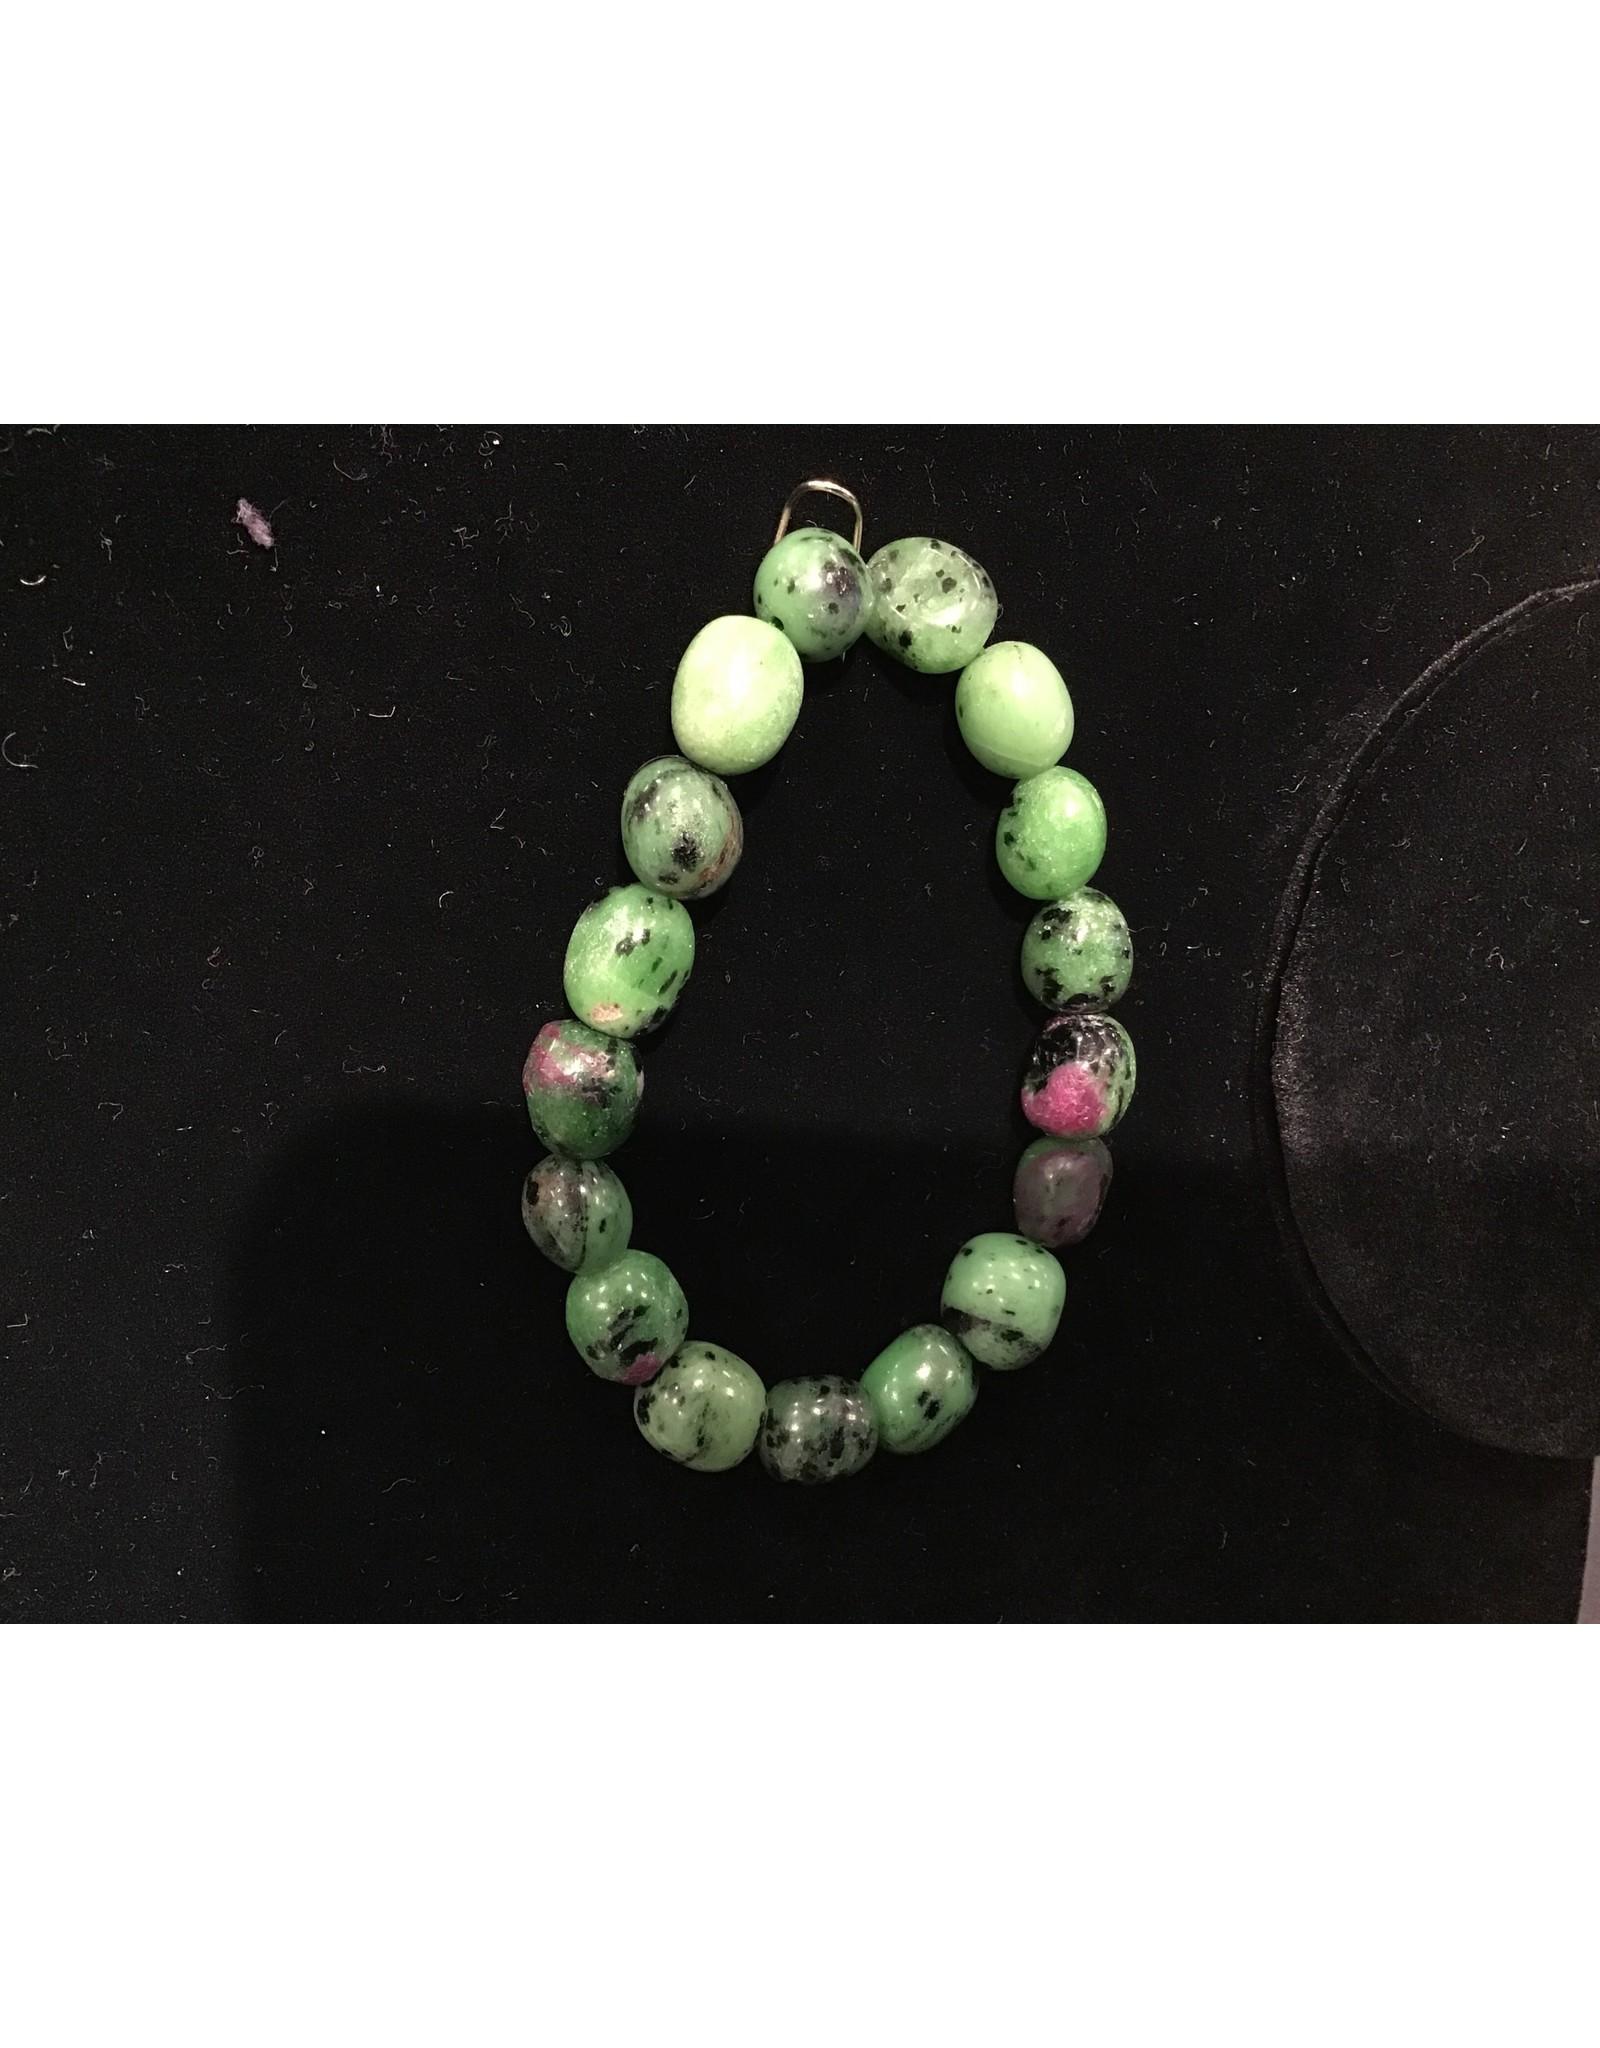 Premium Gemstone Bracelet - Ruby Zoisite